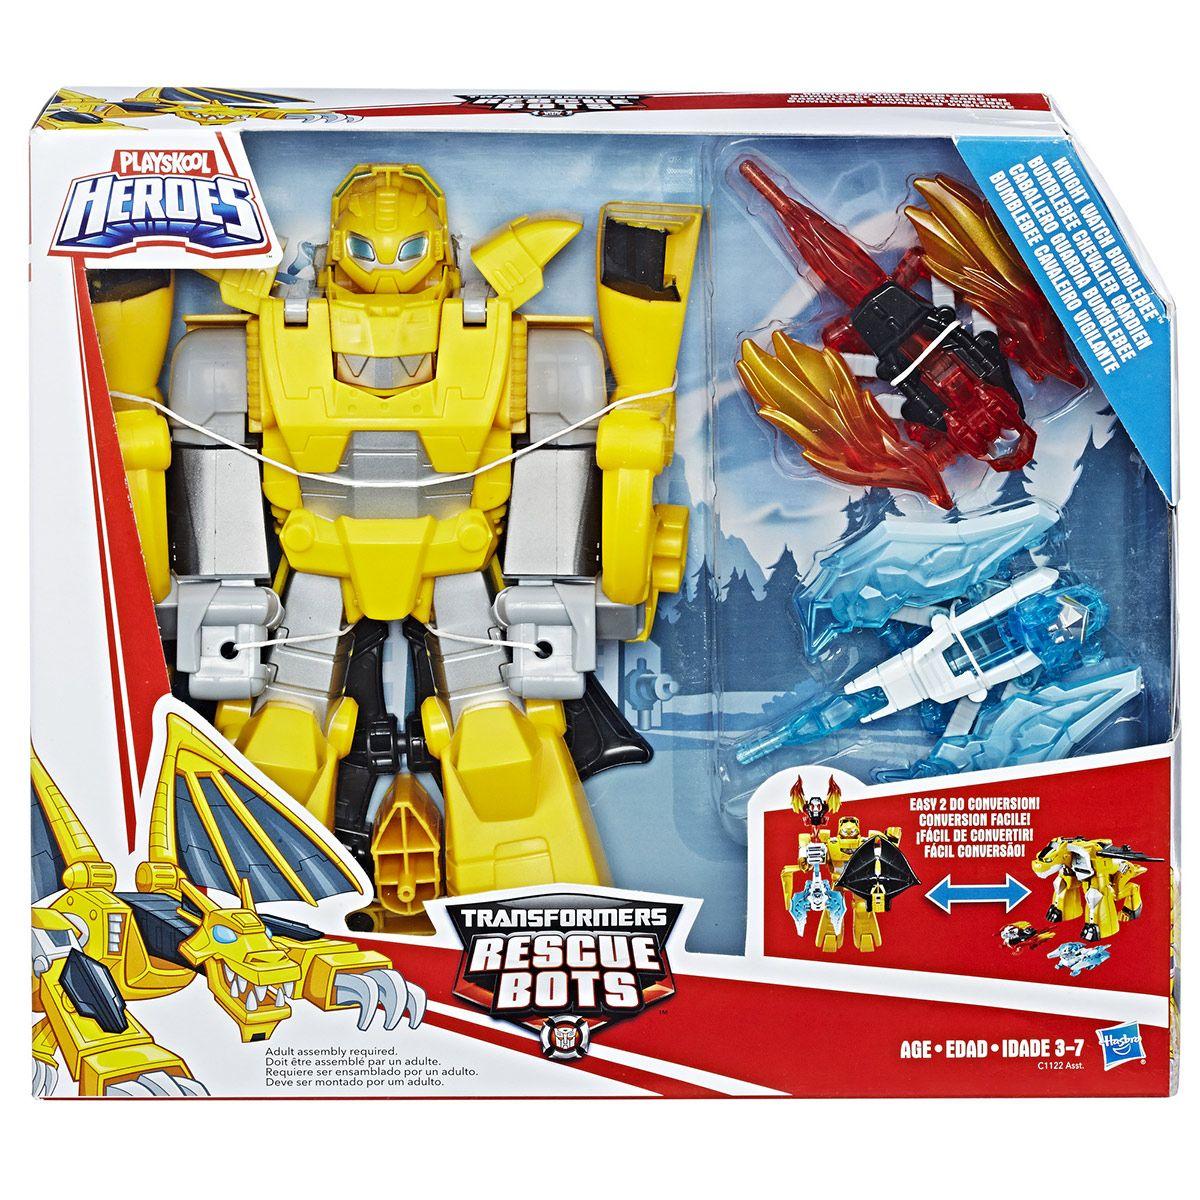 Bumblebee Rescue Transformers Gardien Chevalier Bots Les Monstres bv6yYgIf7